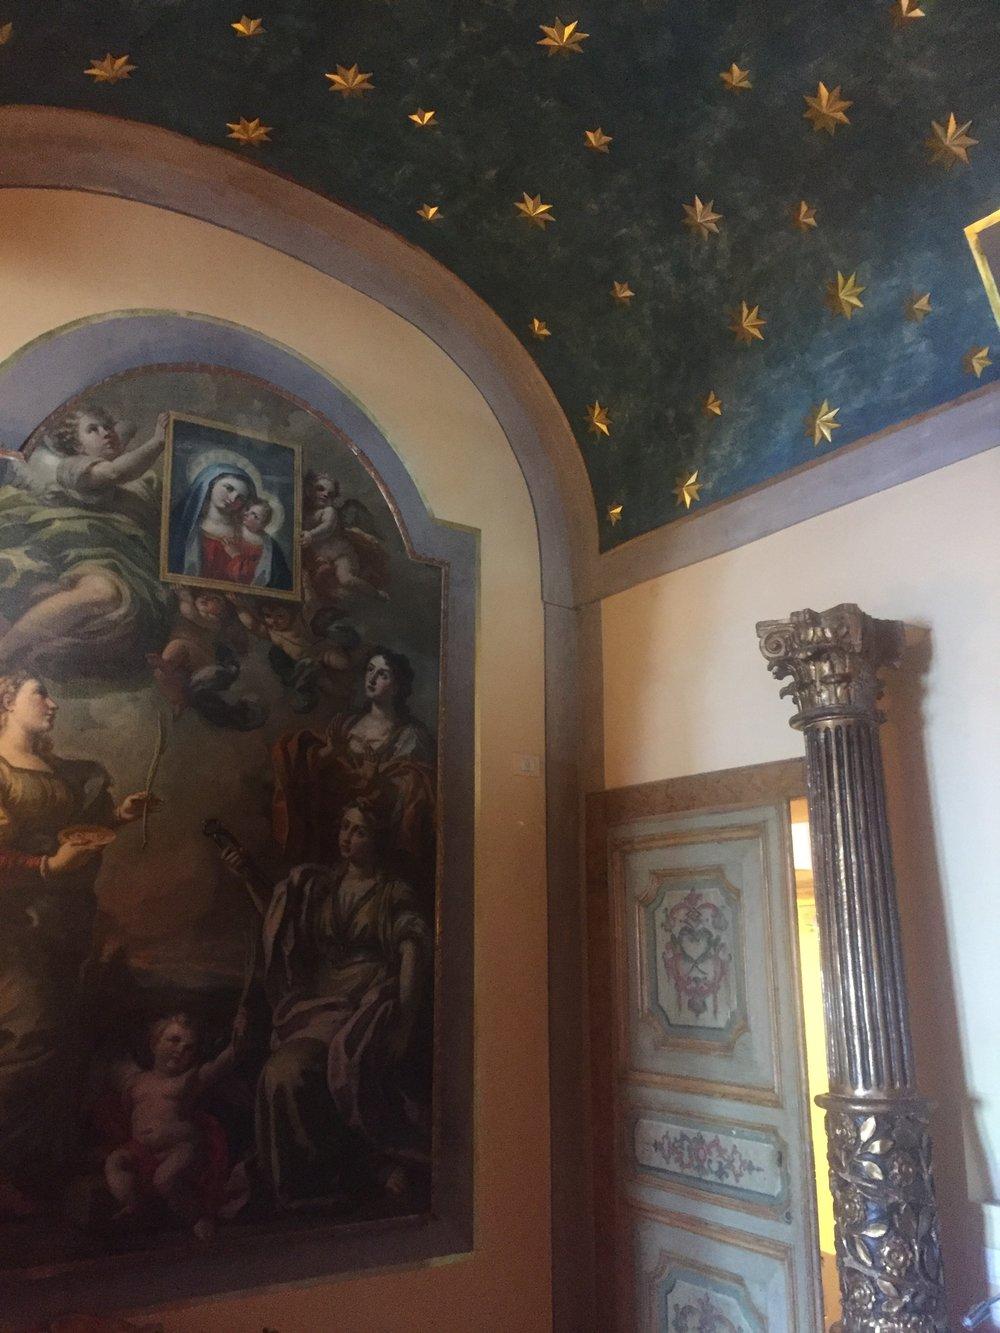 VillaDorata.MasterBedroom.Positano.Italy.LuxuryRetreats.TravelBlogger.JPG